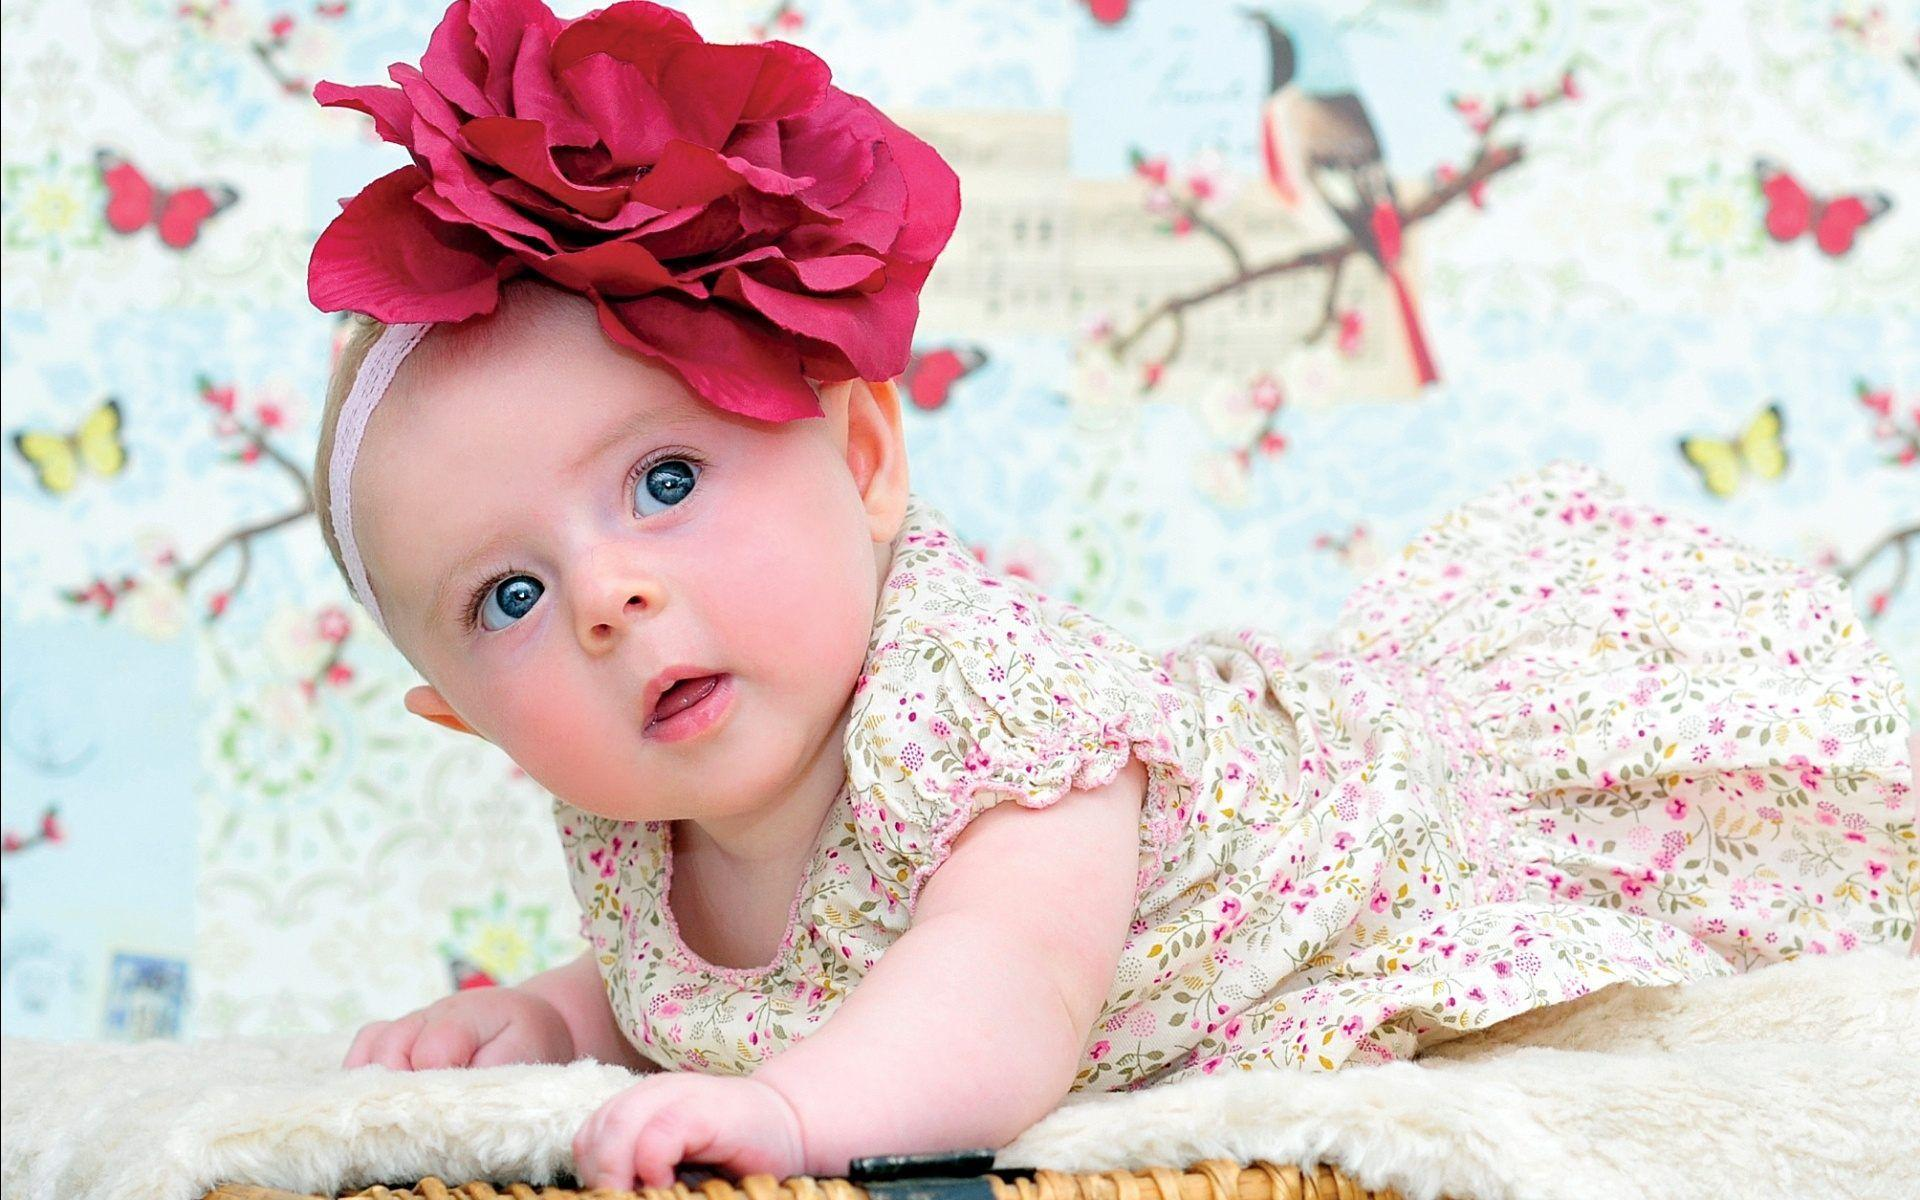 Baby Girls Wallpapers - Wallpaper Cave